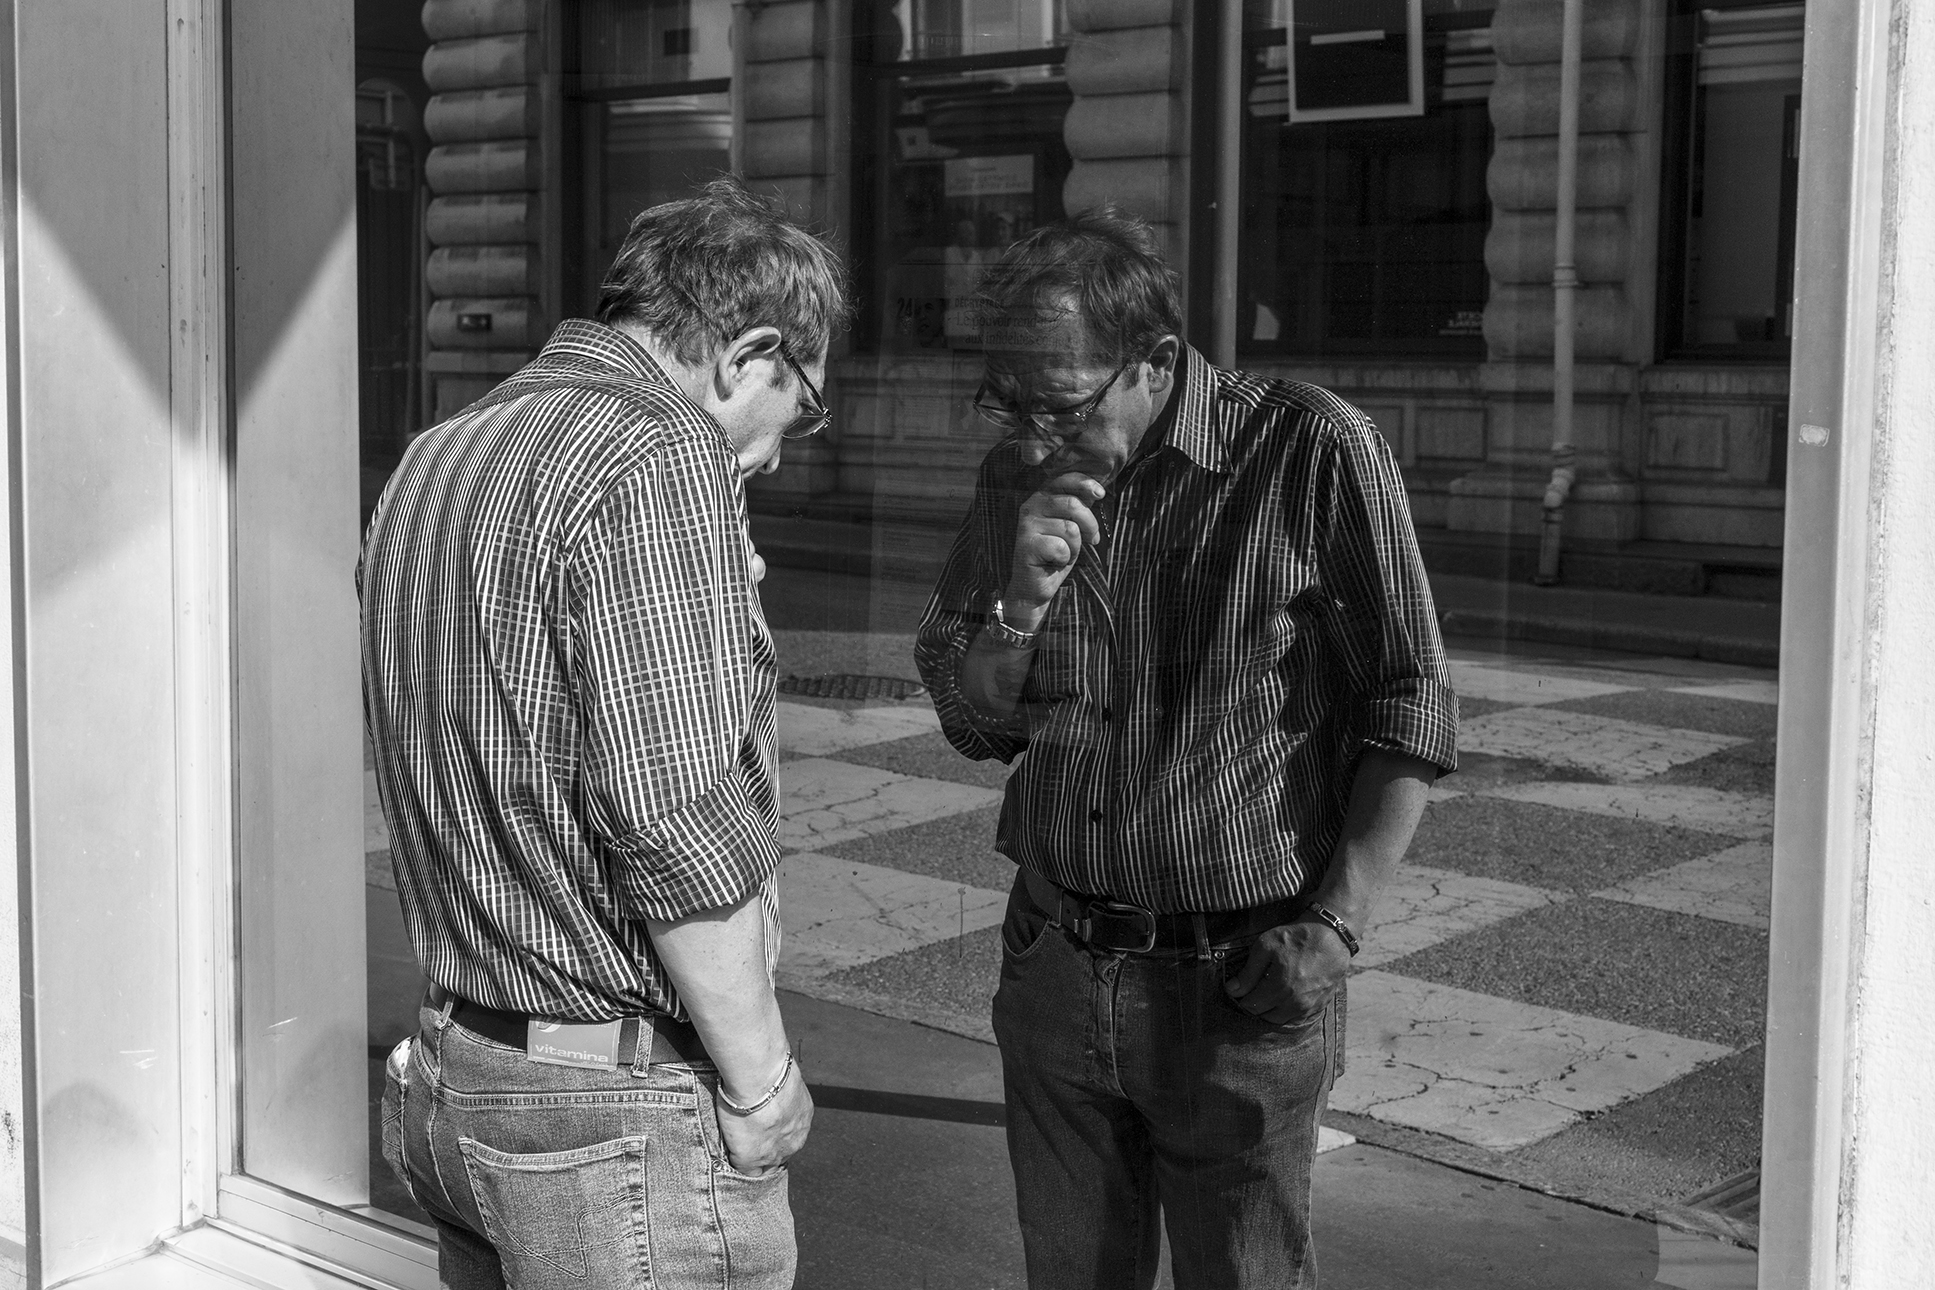 reflexion-Chambery-mai-2011.jpg